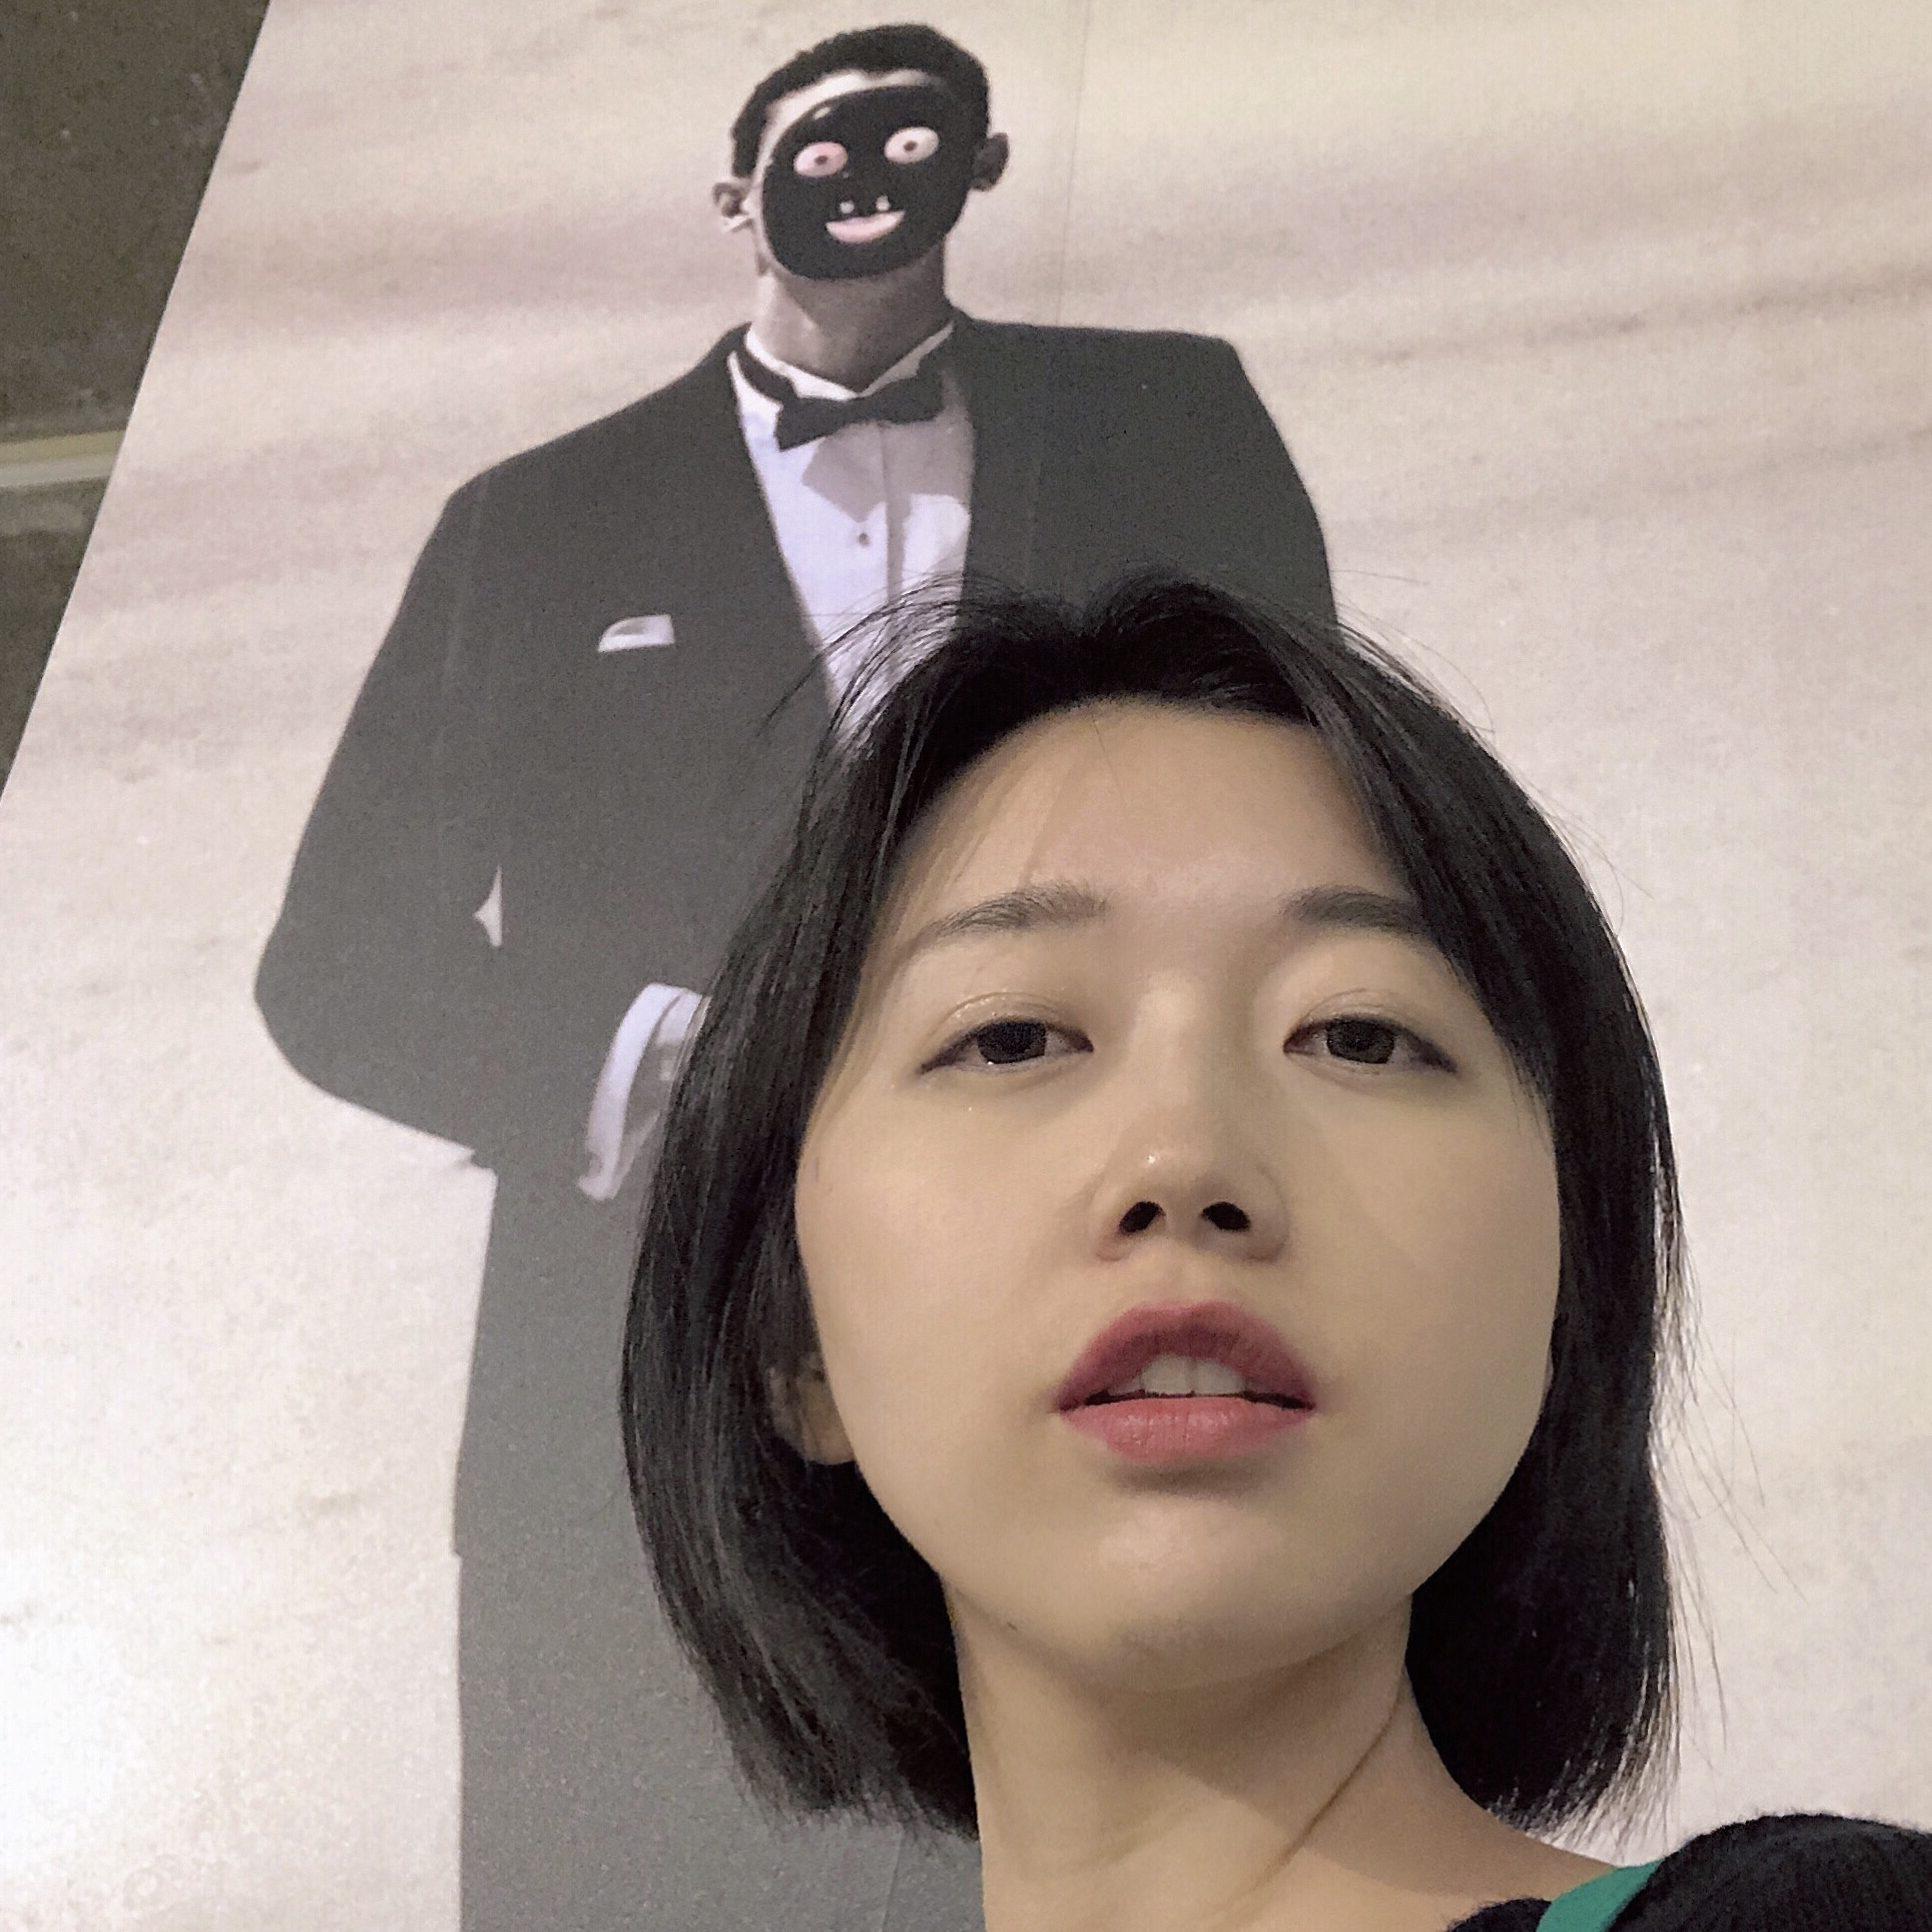 Yangxiaoman - Like A Virgin - Director